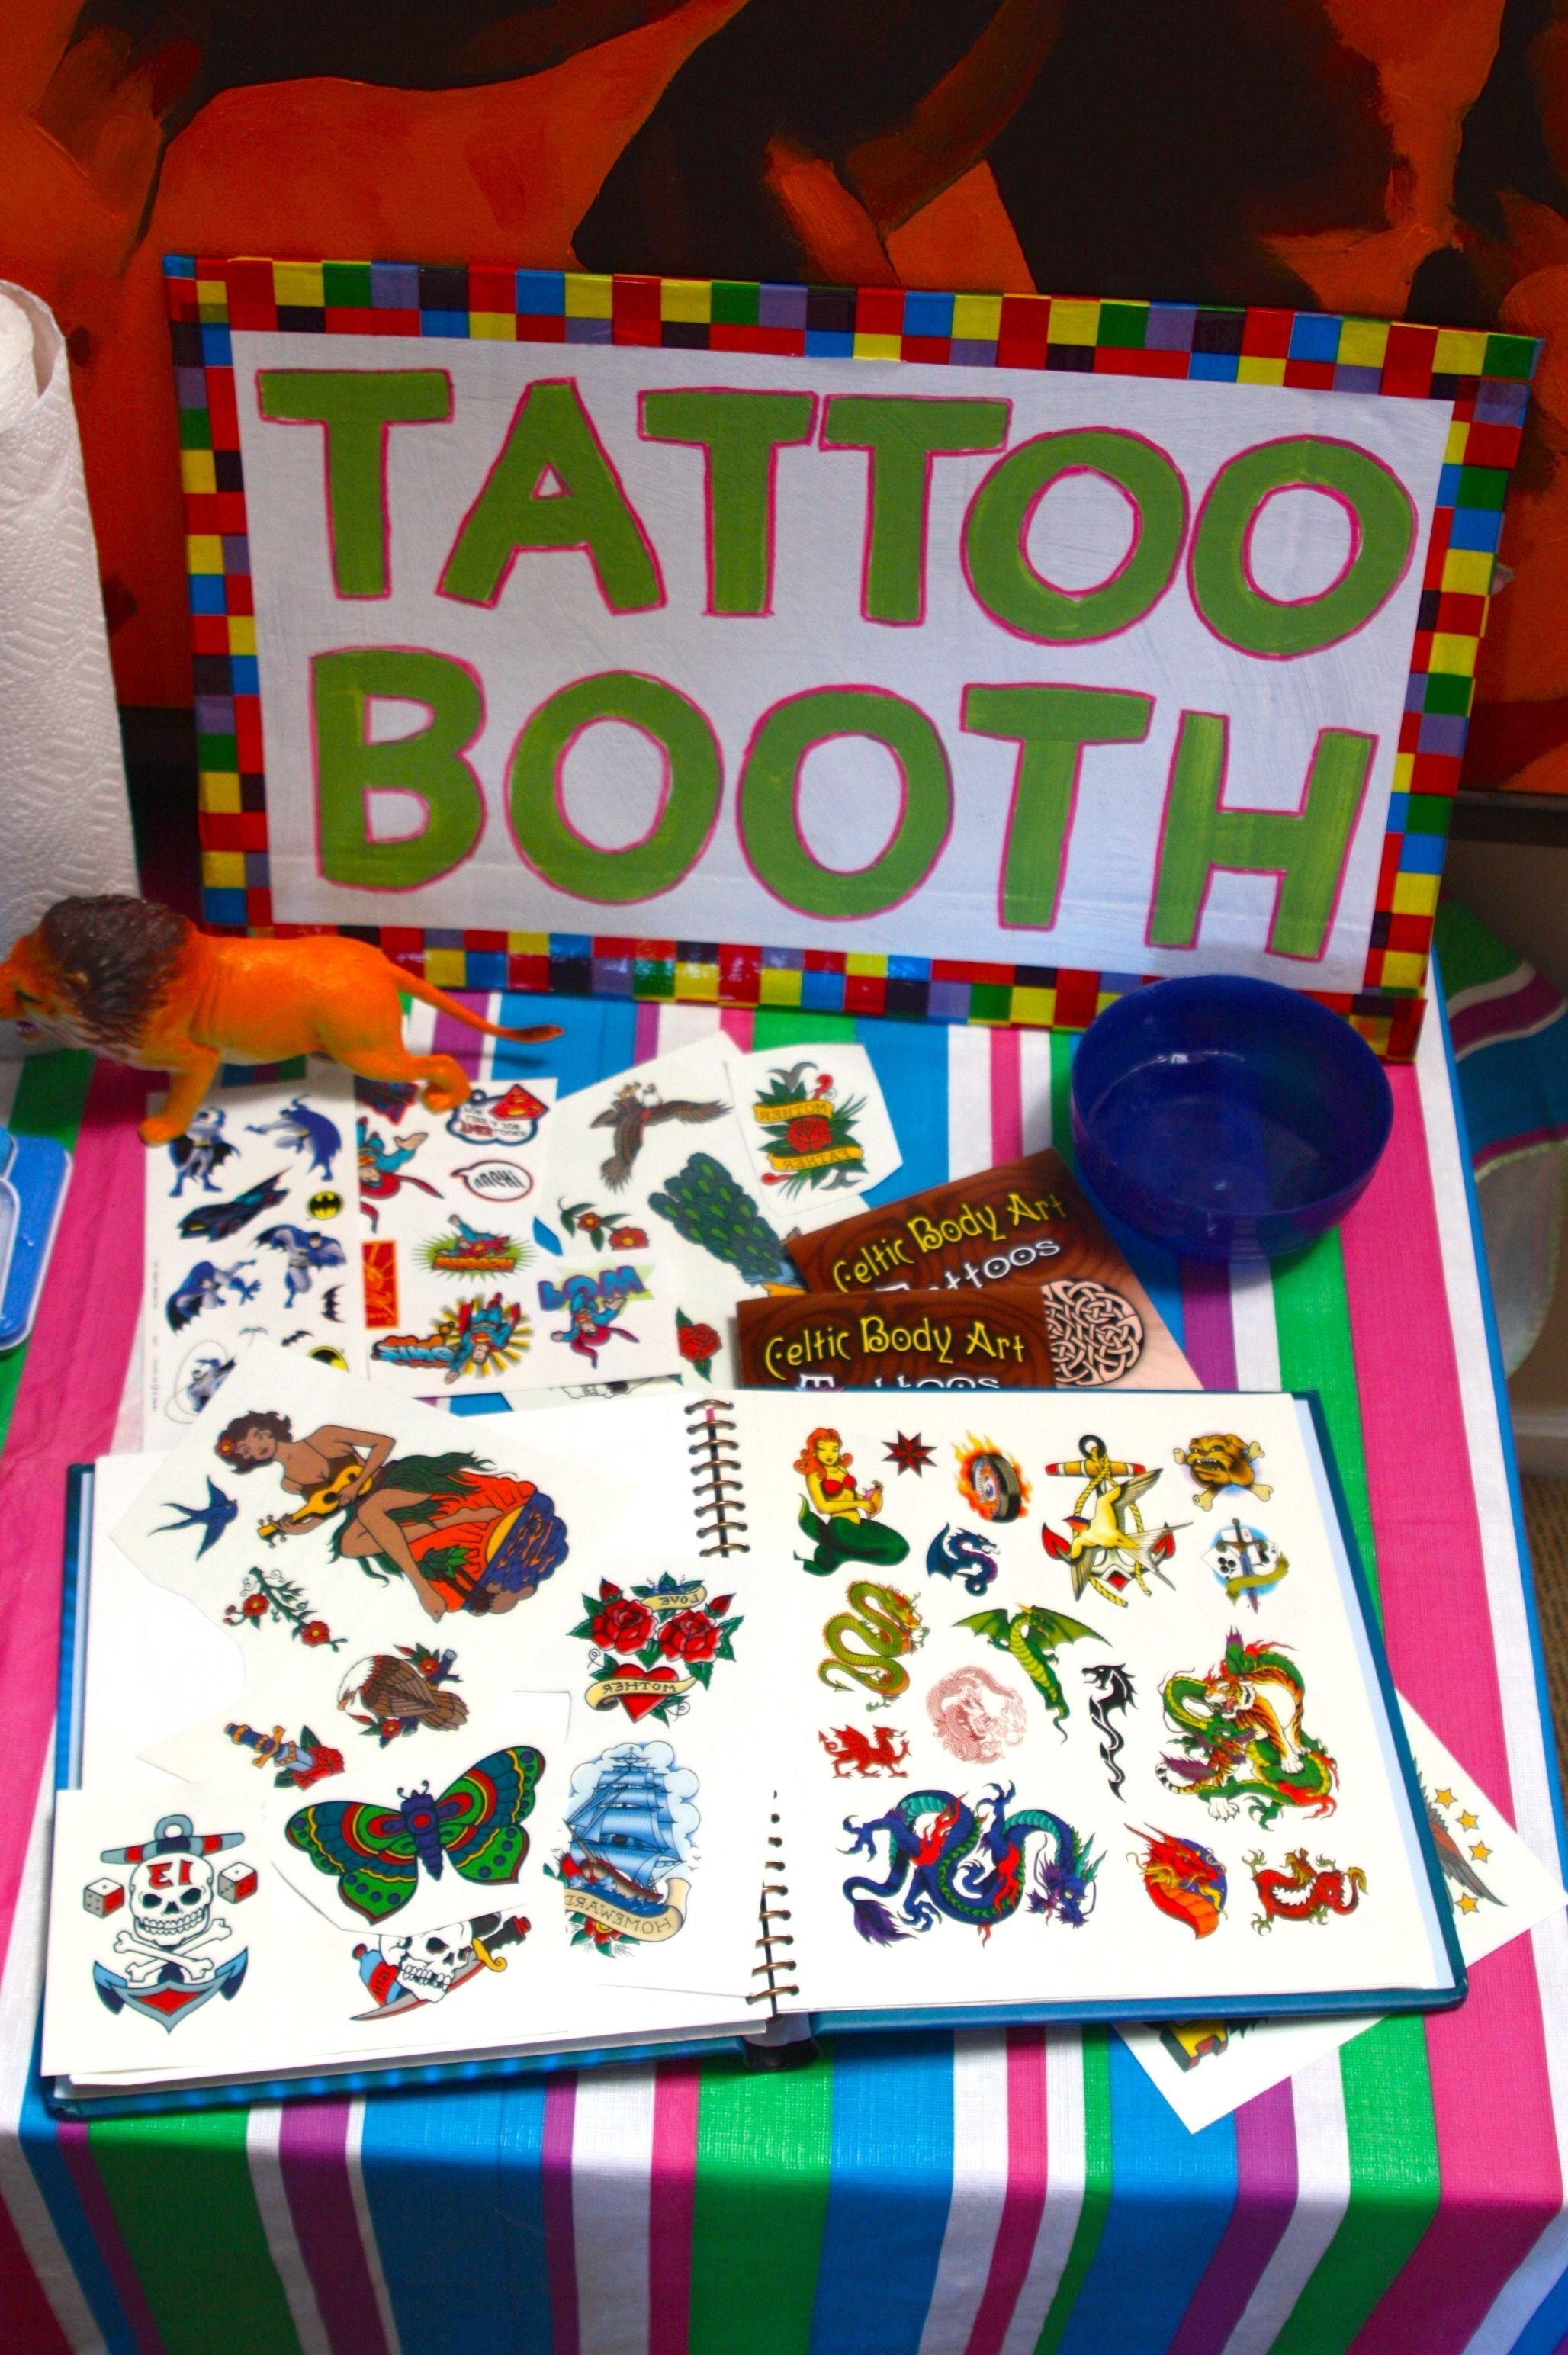 10 Nice Halloween Party Game Ideas For Adults f09f8e88 fiestas infantiles f09f8e82 91 ideas de cumpleanos f09f8e81 tattoo 7 2020